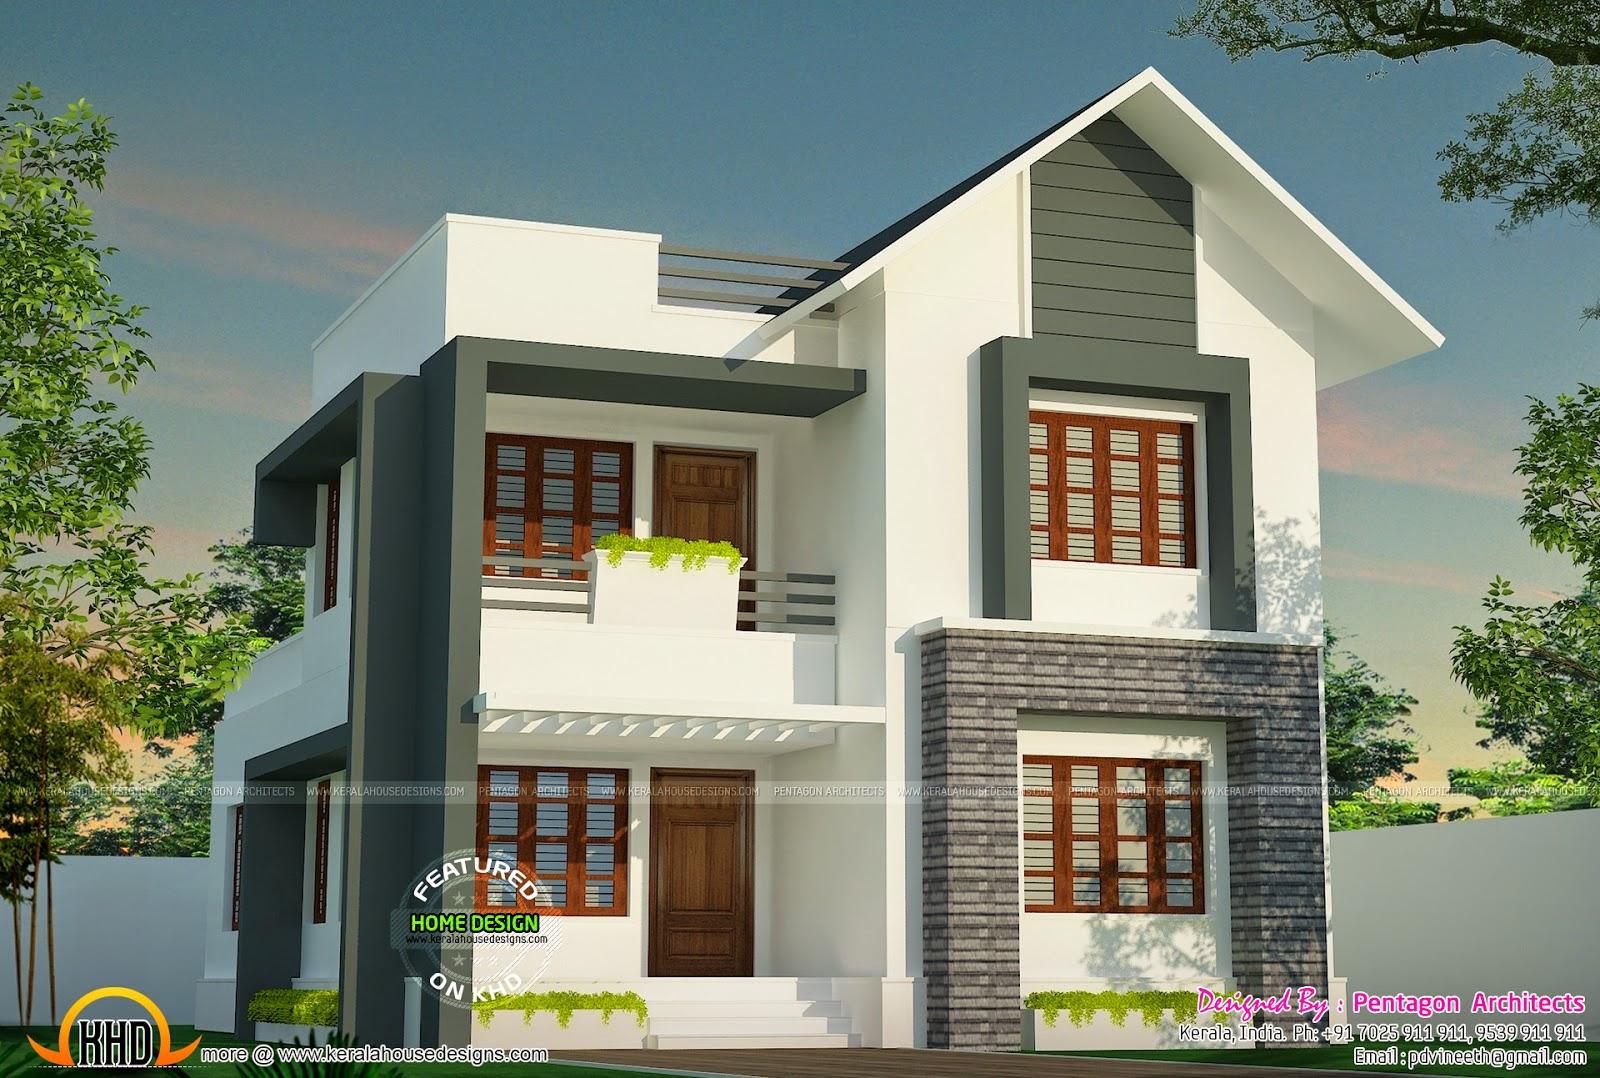 Pentagon house design - House design